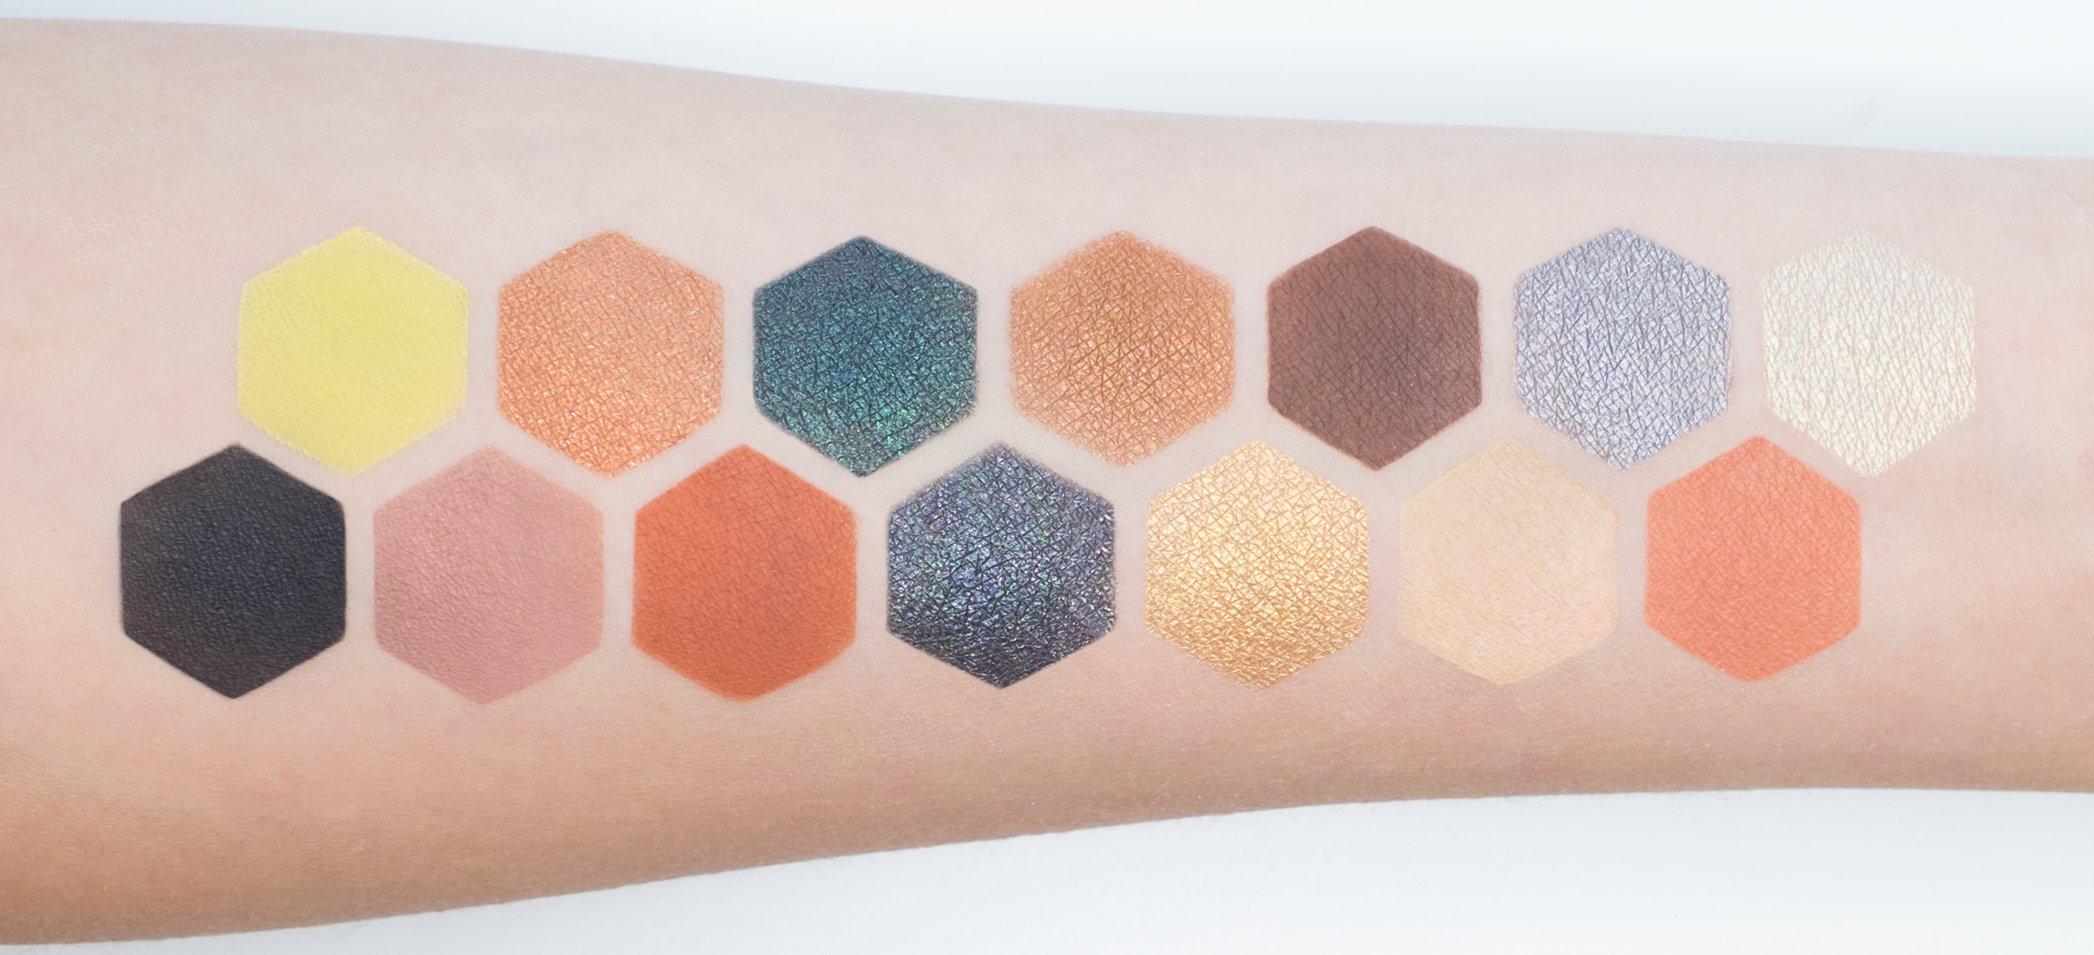 sunkissedblush-anastasia-beverly-hills-abh-prism-eyeshadow-palette (2 of 8)